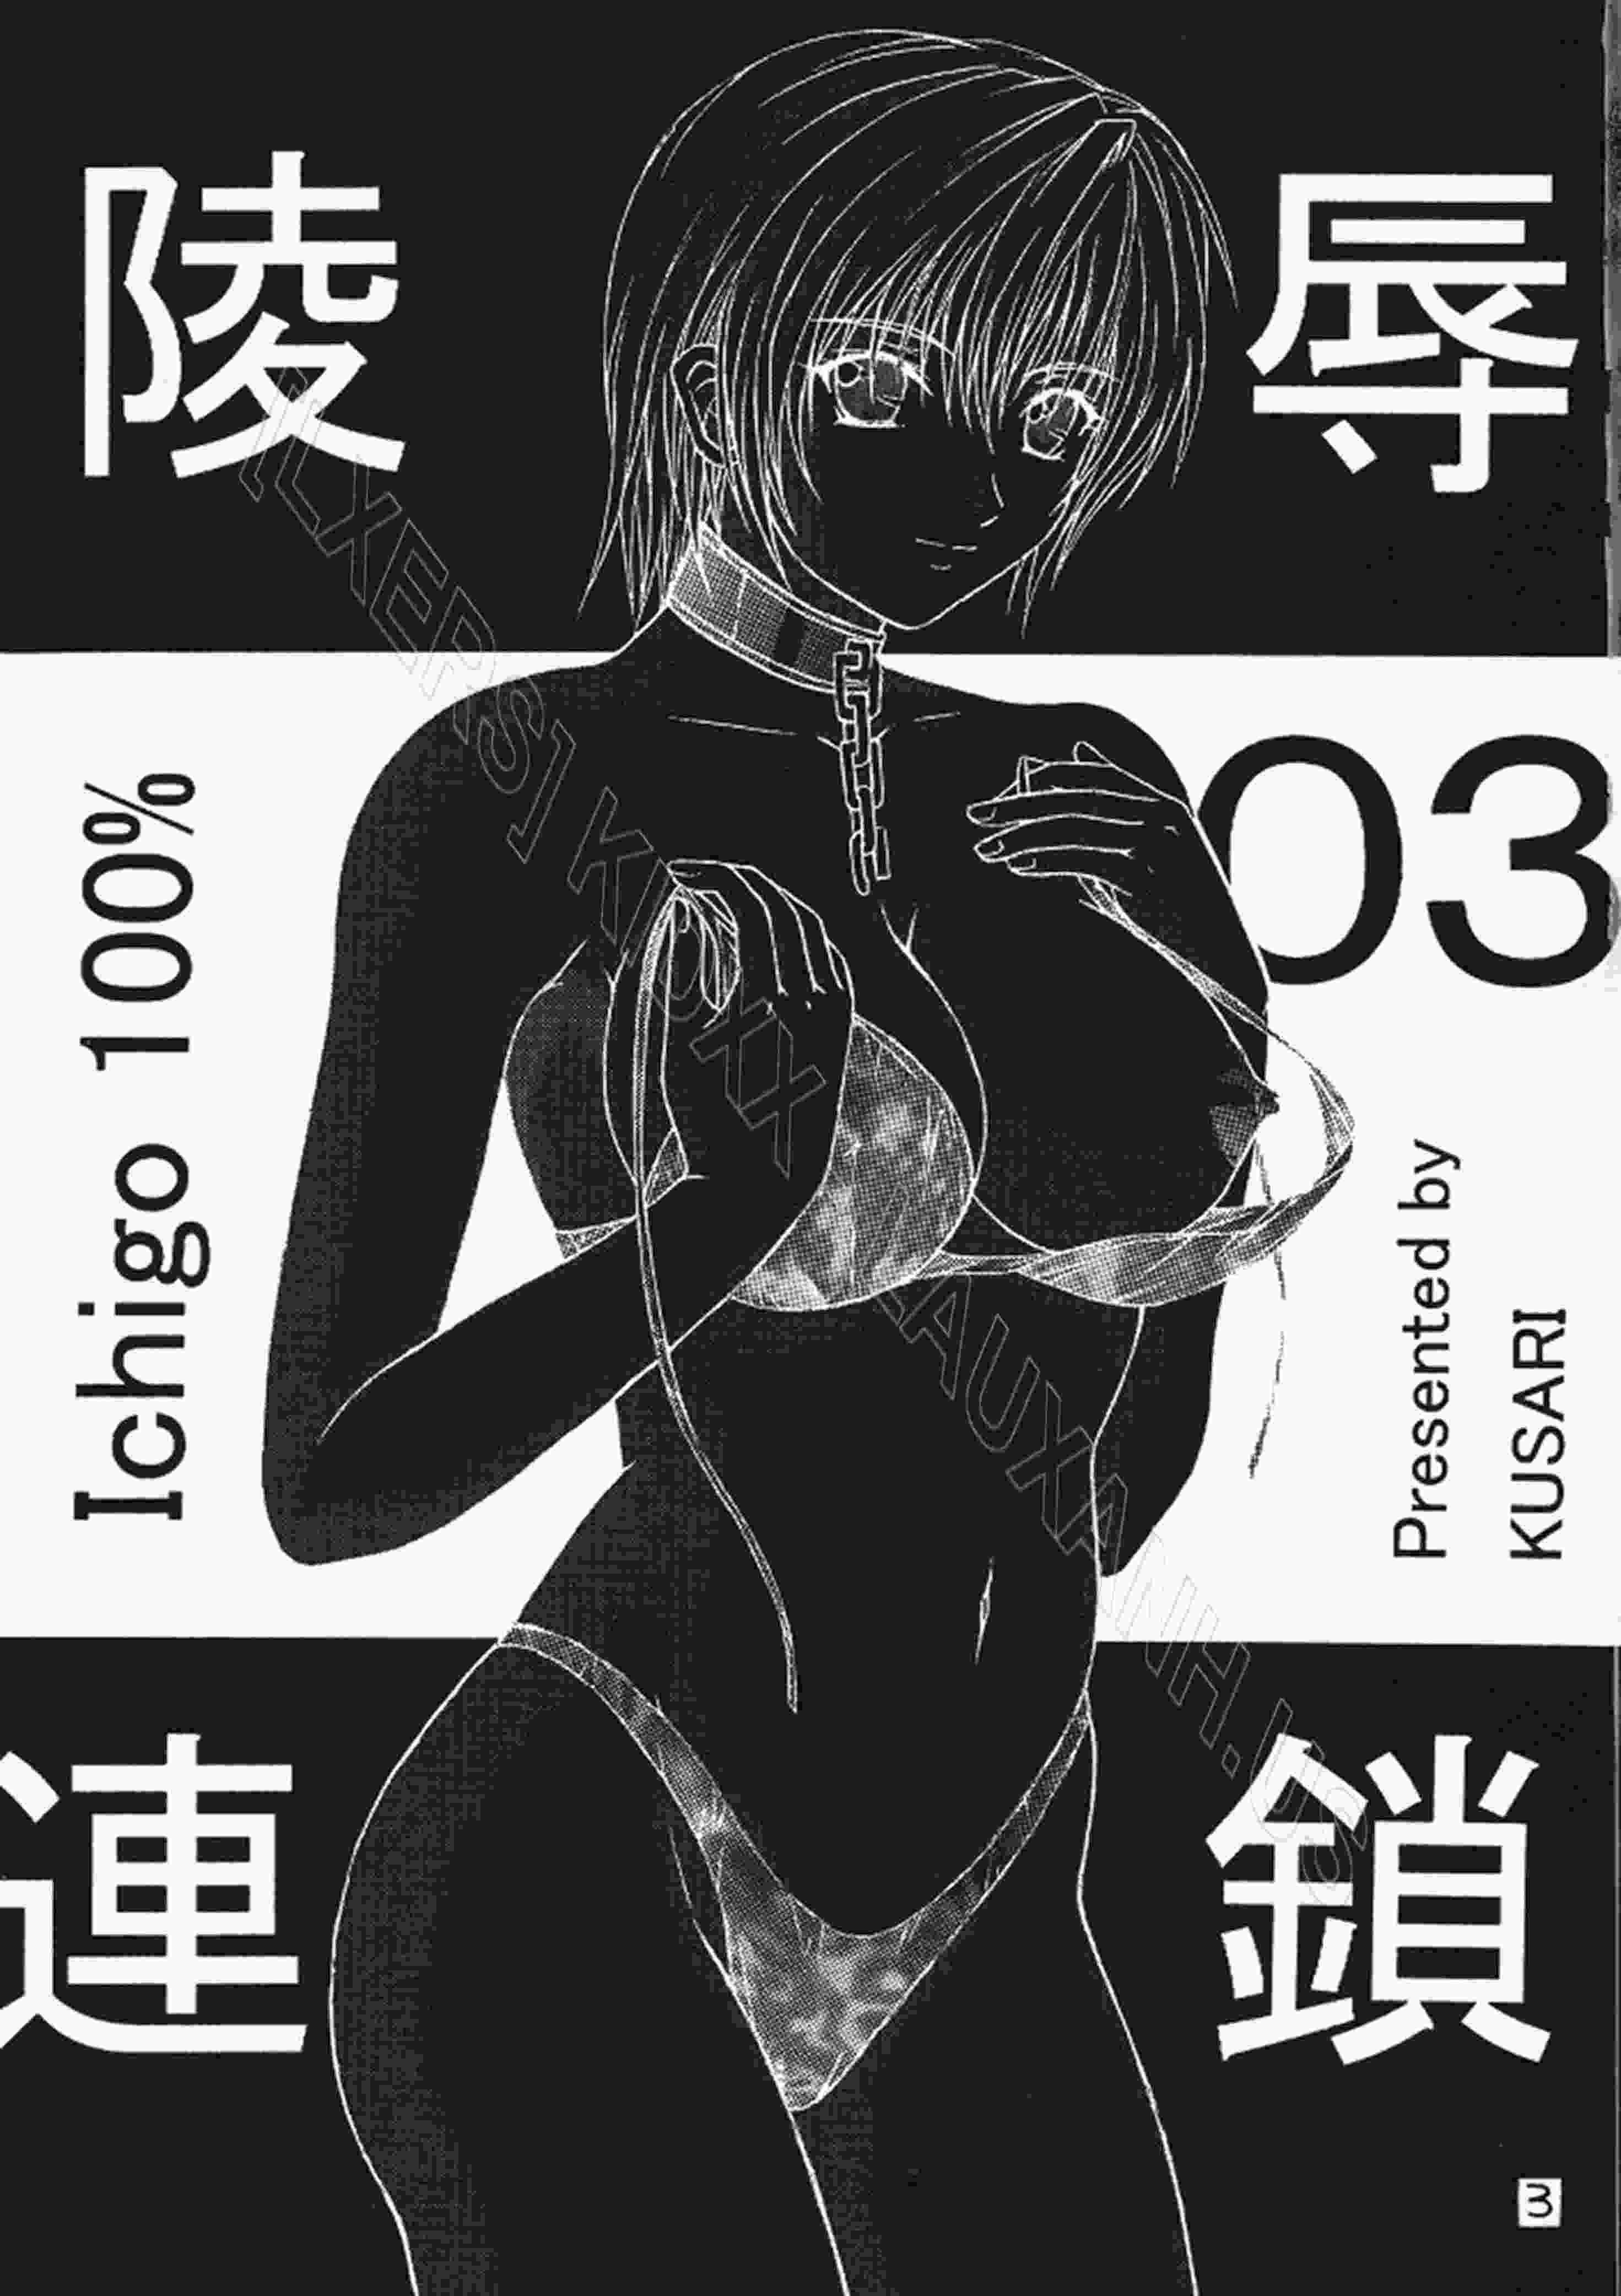 TruyenHay.Com - Ảnh 2 - Ryoujoku Rensa Chapter 3